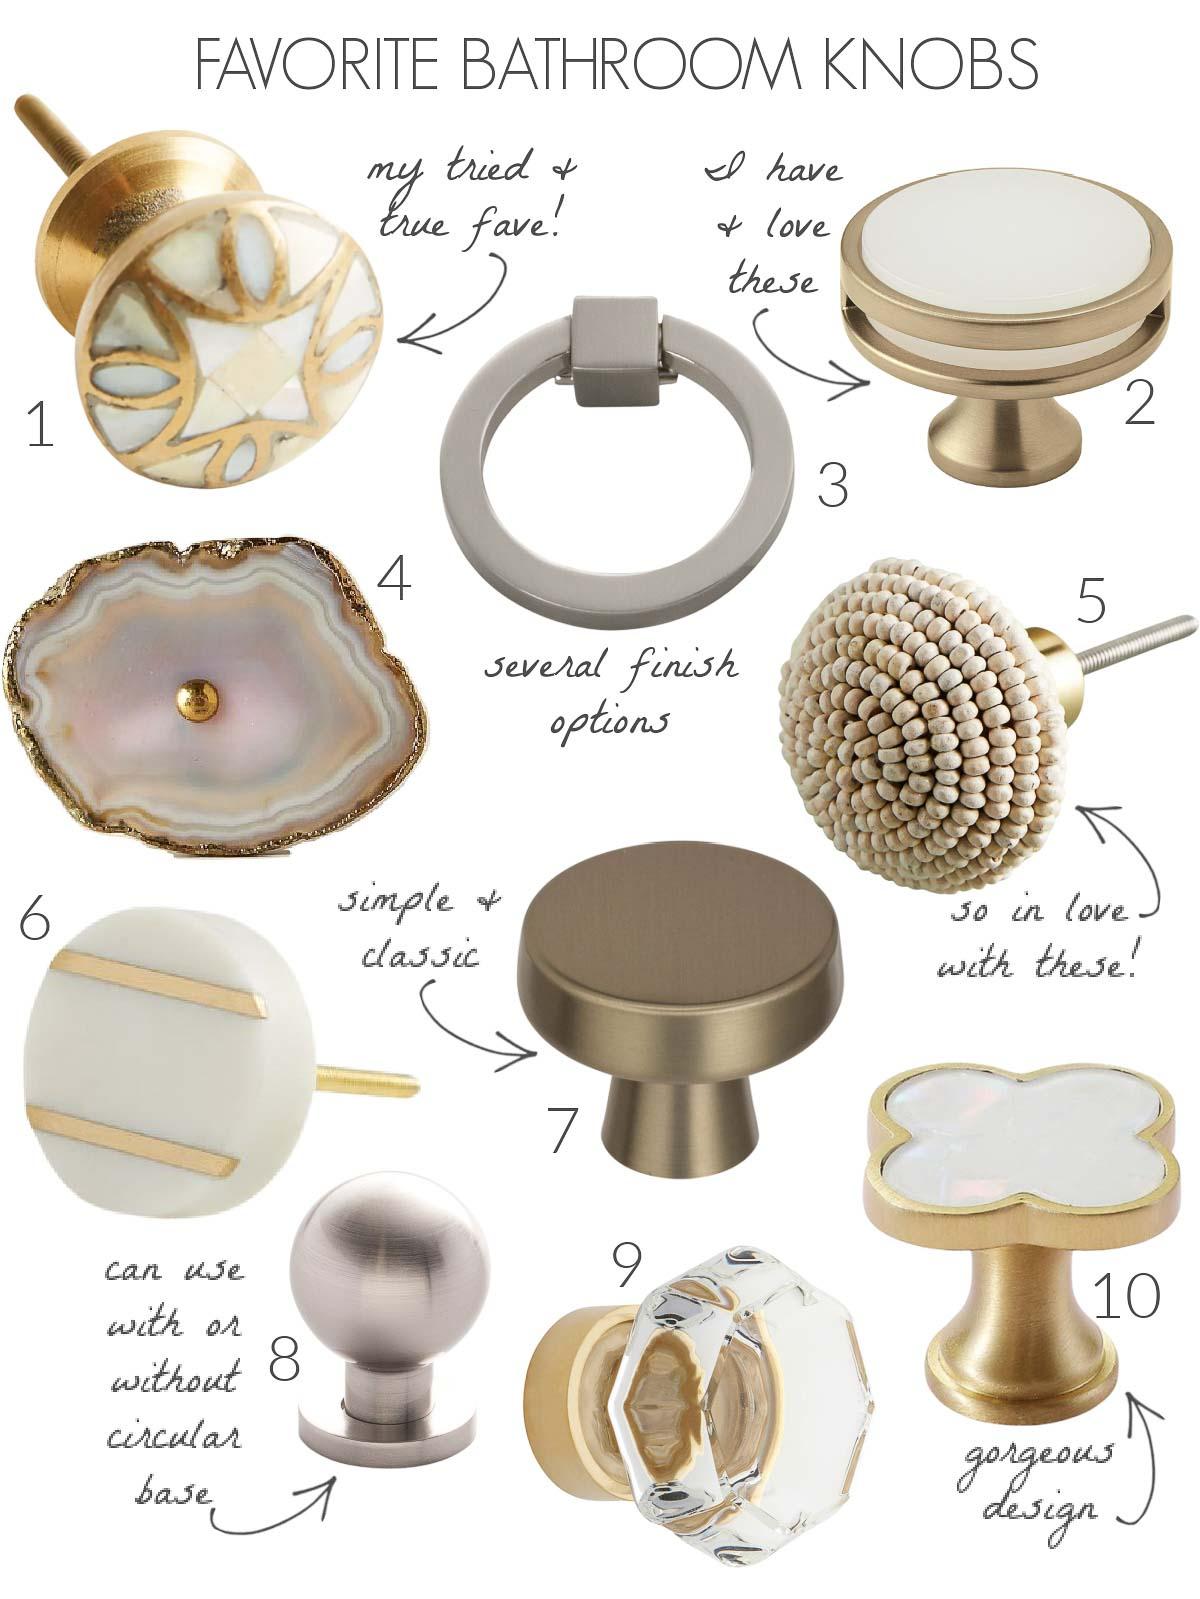 Stylish bathroom cabinet knobs!